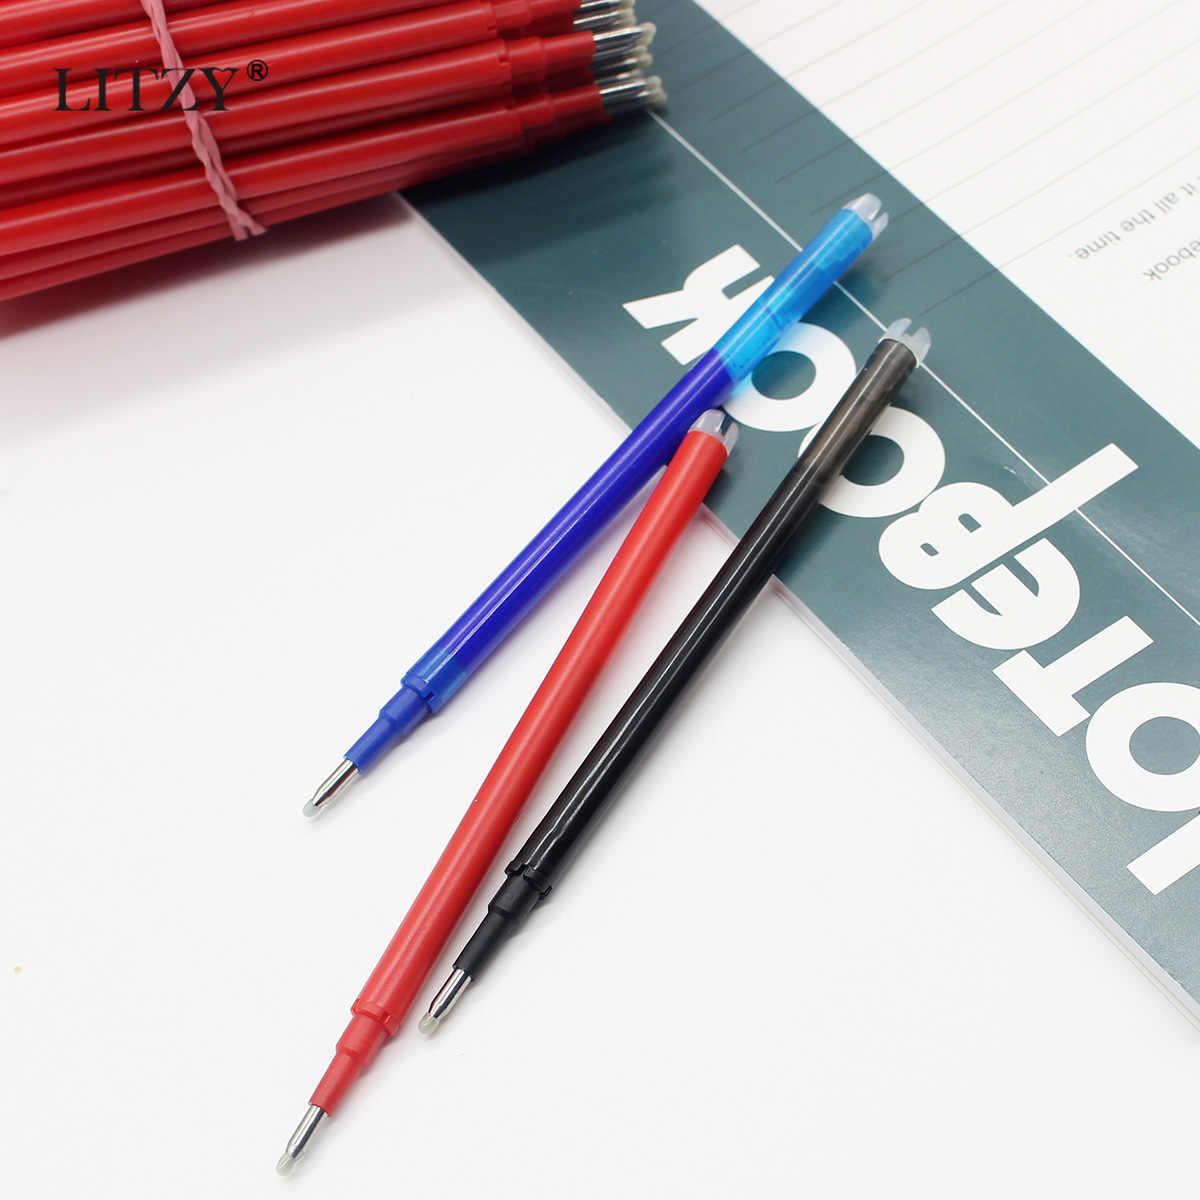 10pcs מחיק ג 'ל עט מילוי 0.7mm שחור/כחול/אדום דיו מחיק כדור עט מילוי משרד בית הספר כתיבה מכתבים אבזרים